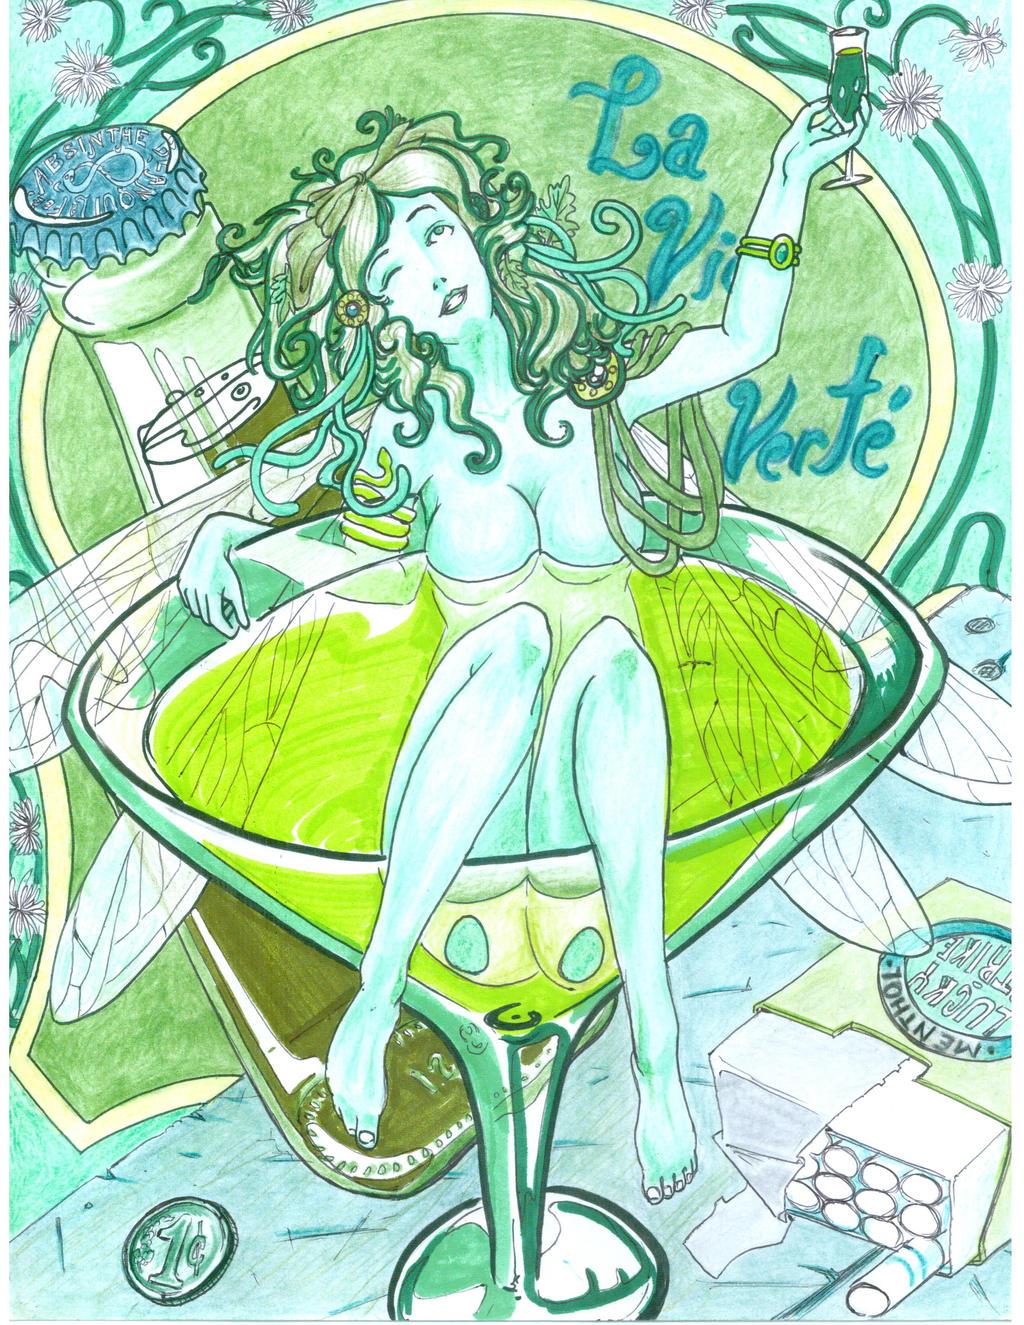 La vida en Verde by sevenquest